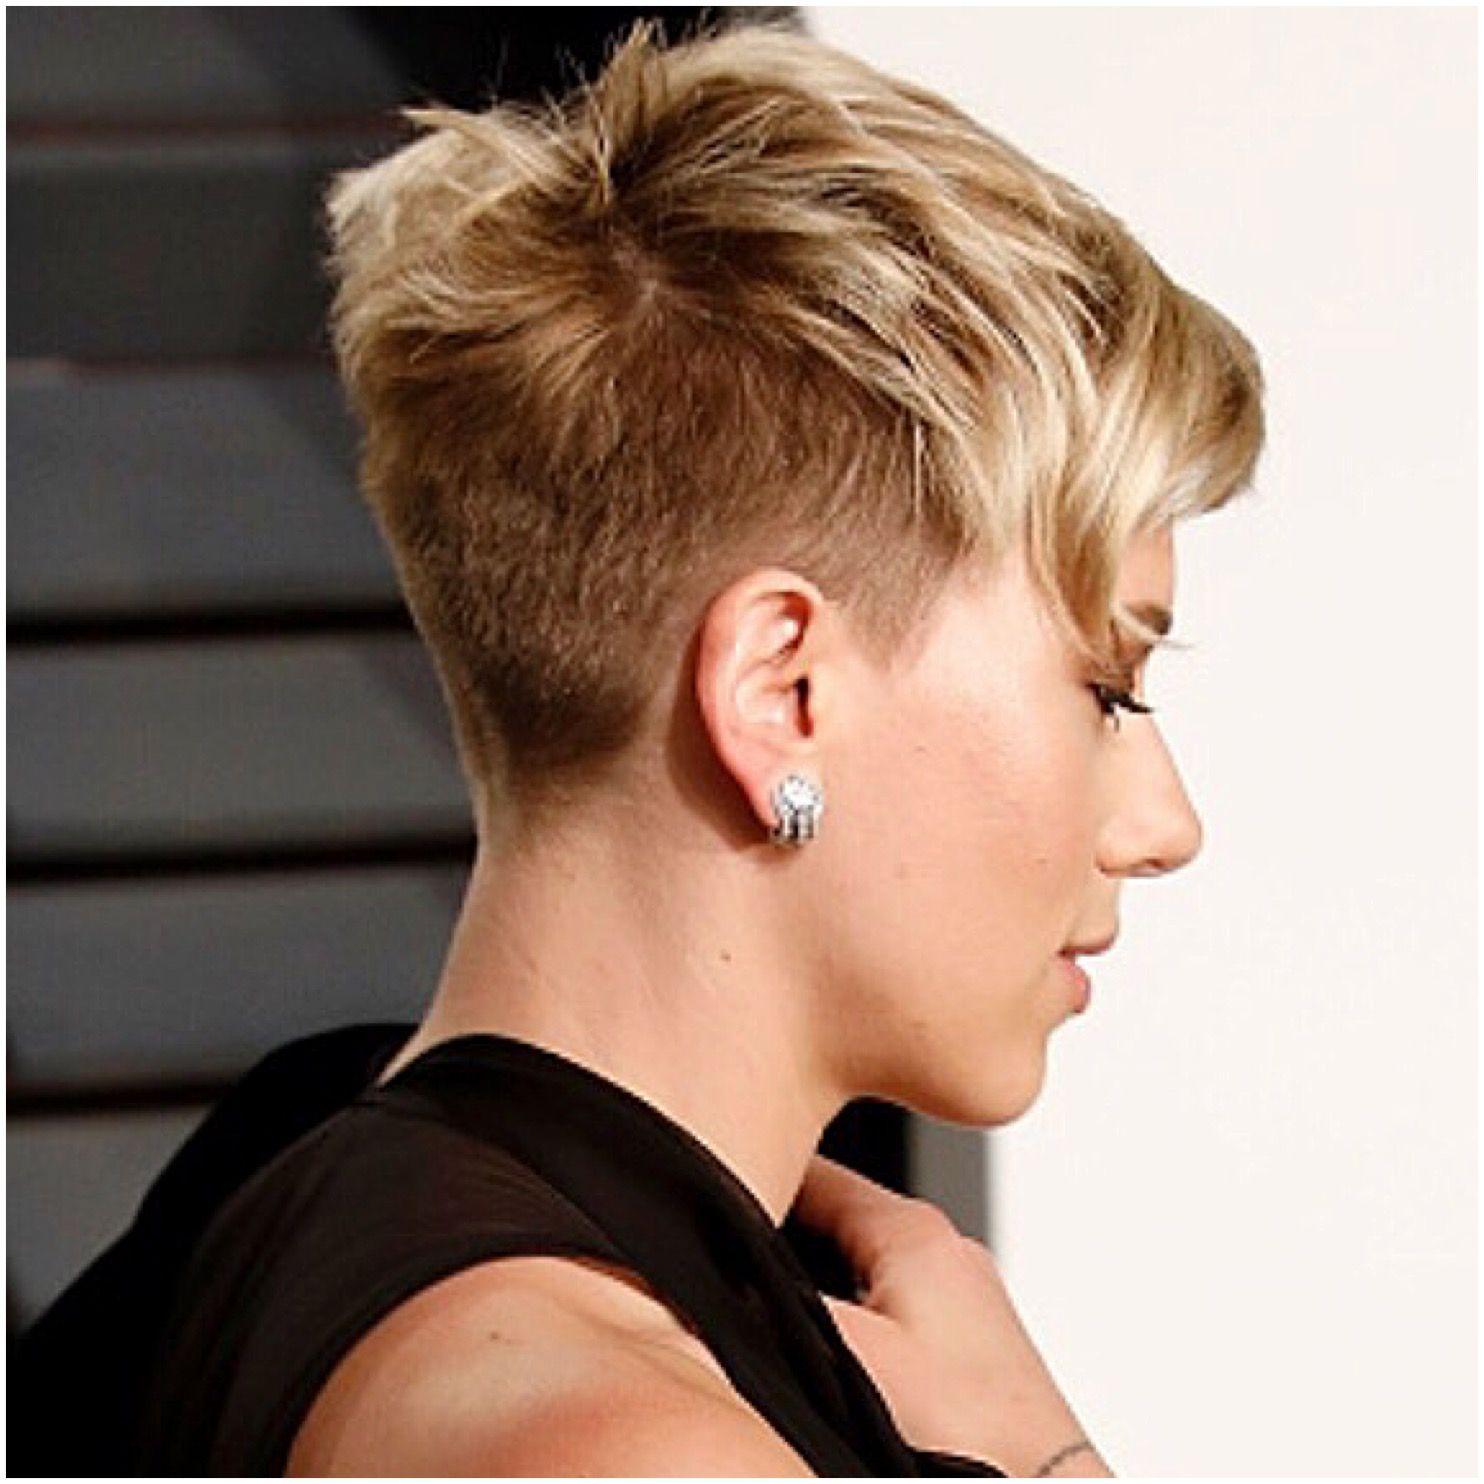 Scarlett Johansson #gettyimages | Short hair | Pinterest ...